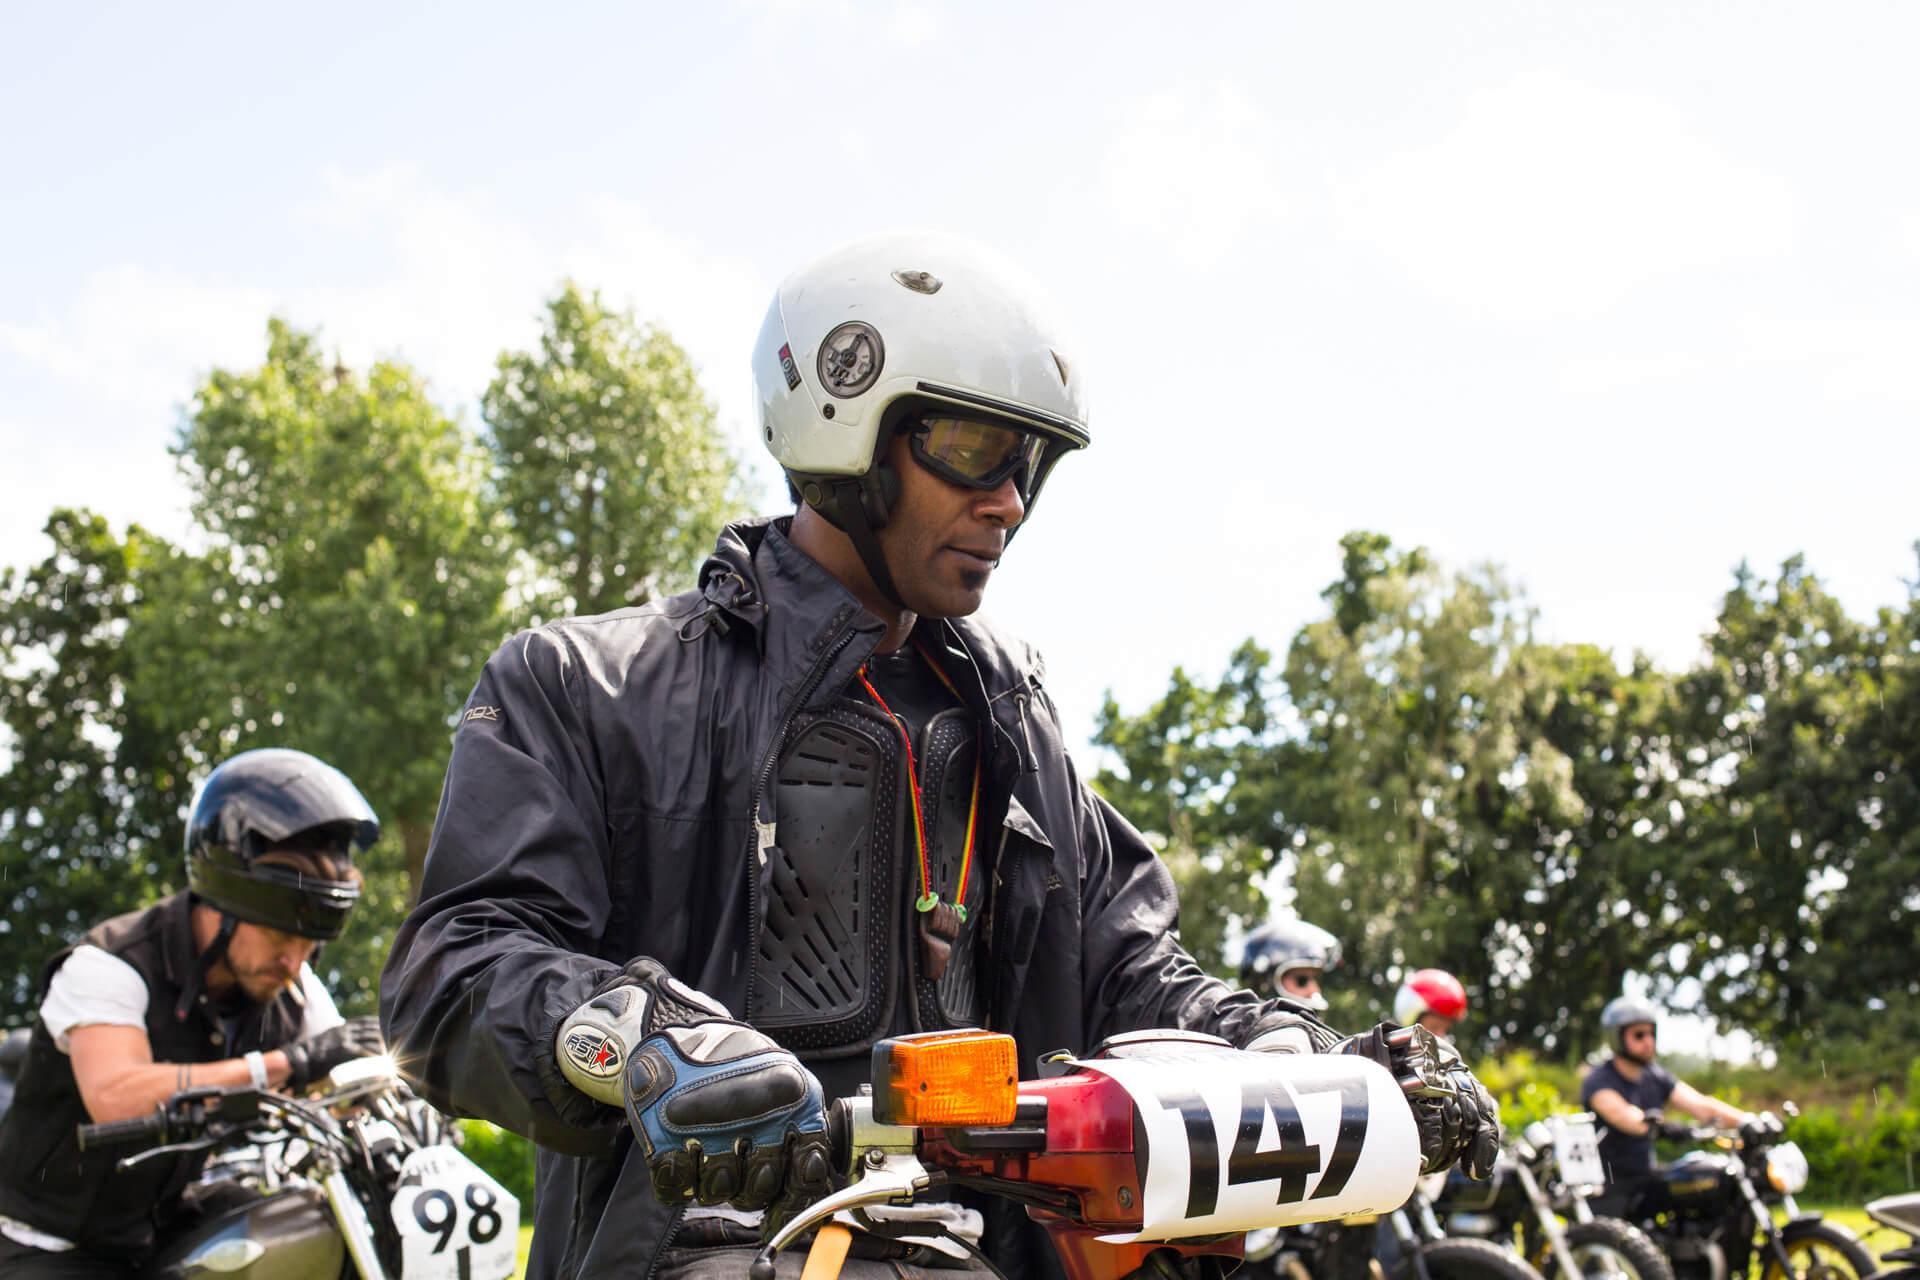 Malle Mile, Event, Motorcycle, Richard, Summer, WeAreShuffle, Agency, Photography, Film, Production, Malle London, Triumph, Flag, Biker, Field, Race, Helmet, Dirt, Scooter